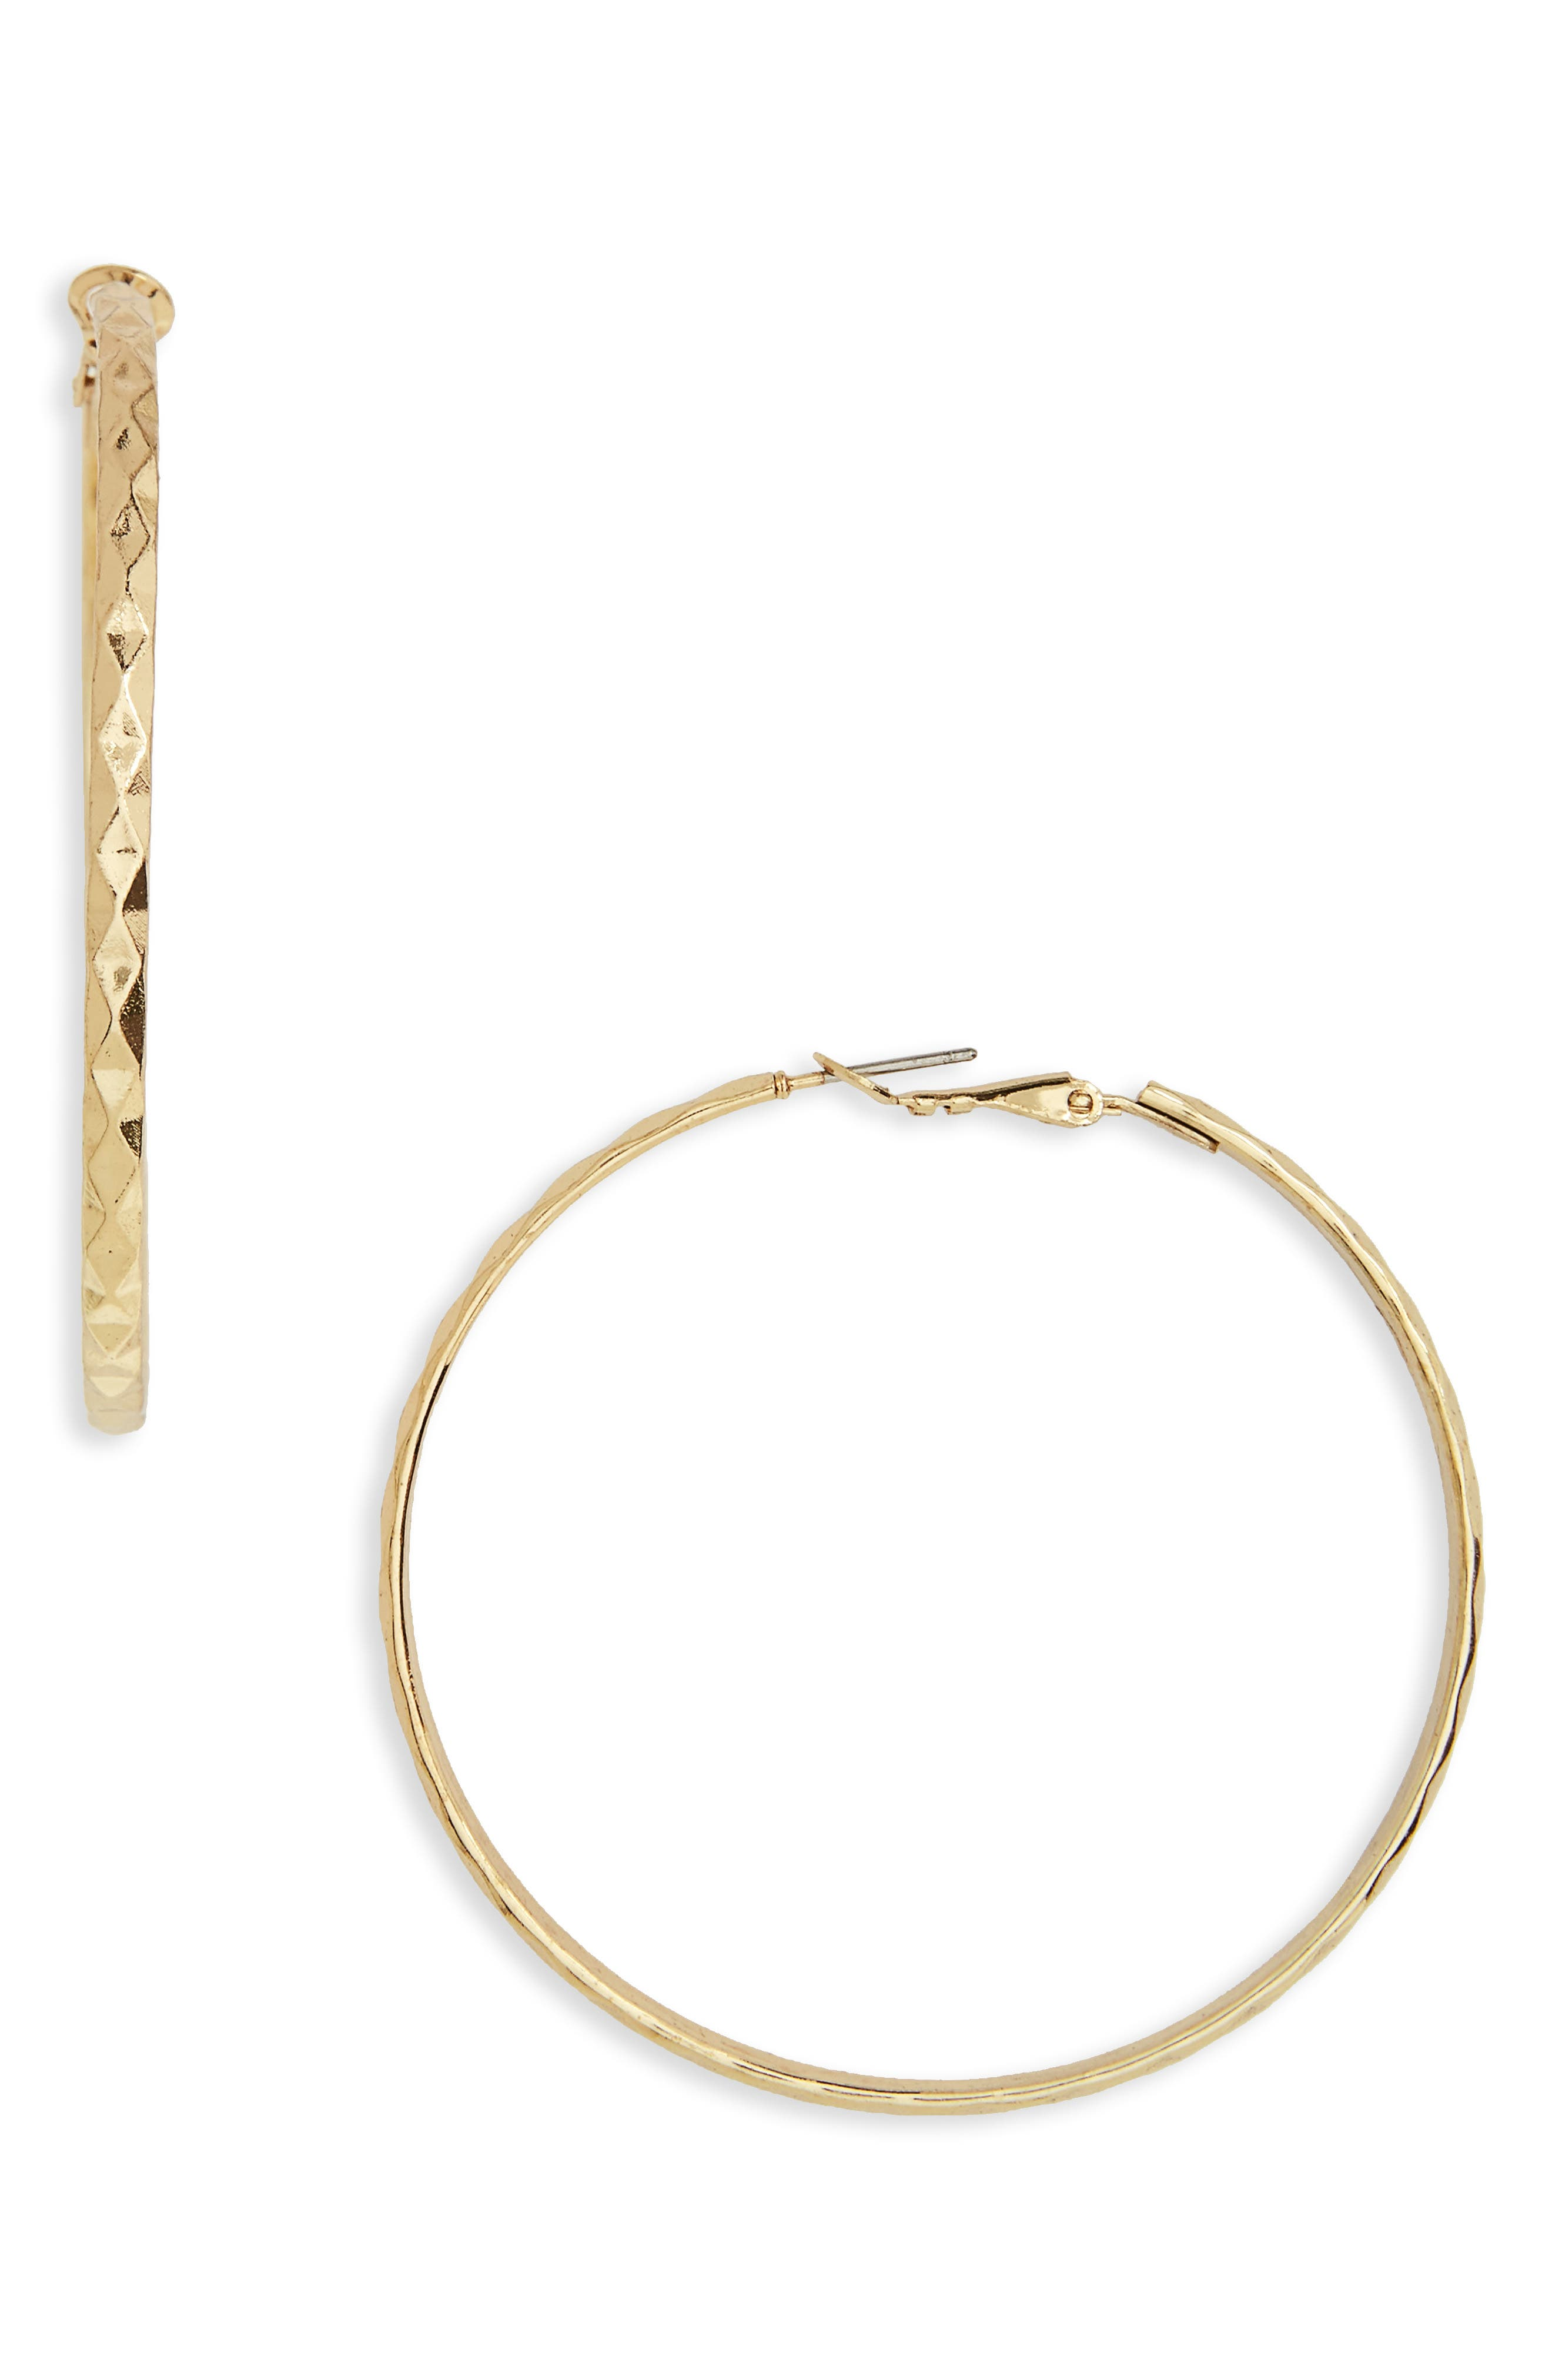 Hammered Hoop Earrings,                         Main,                         color, Gold